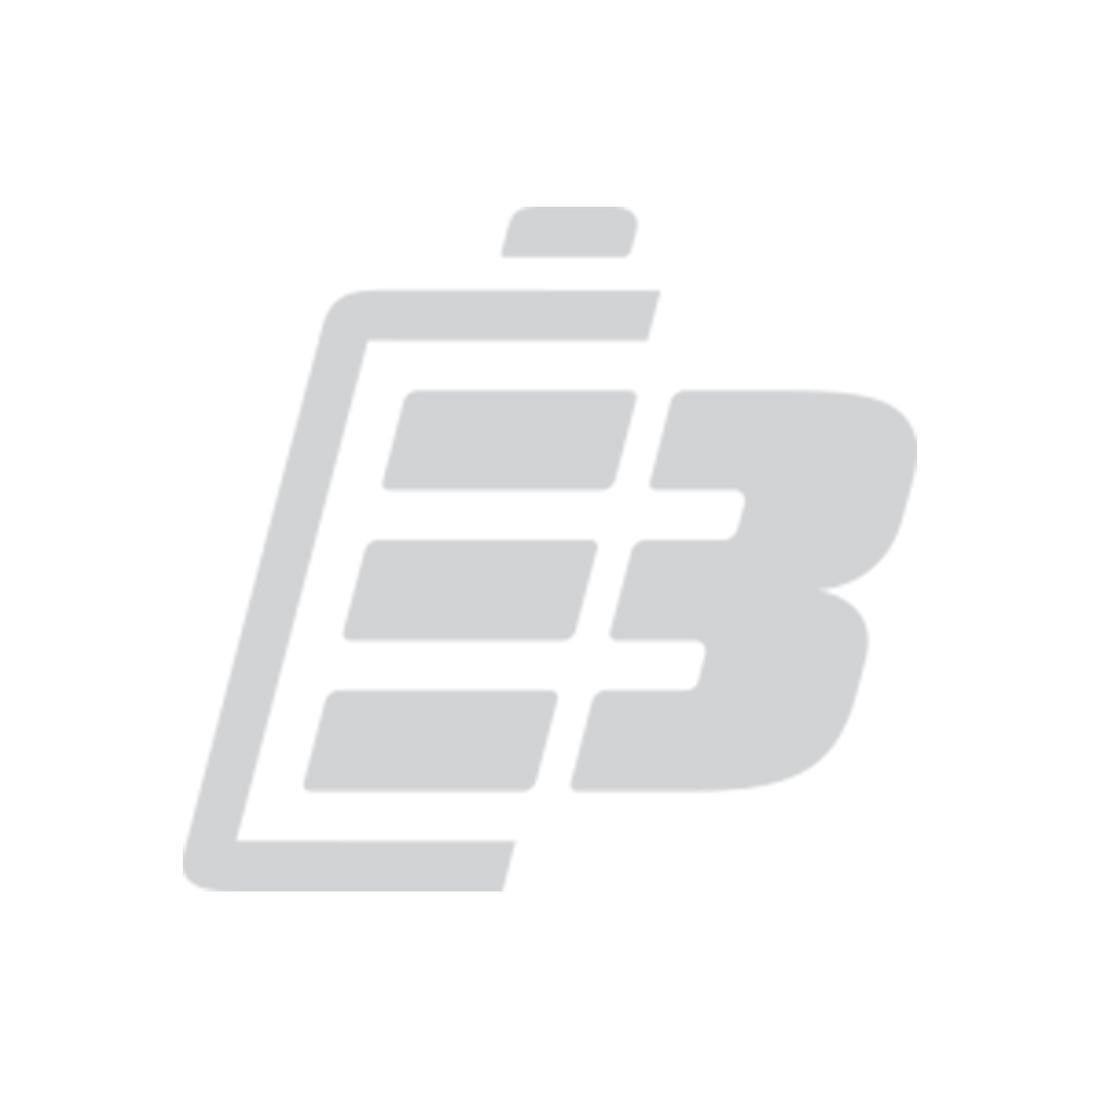 Choetech HUB-M19 7 in 1 Multiport USB Type C Hub